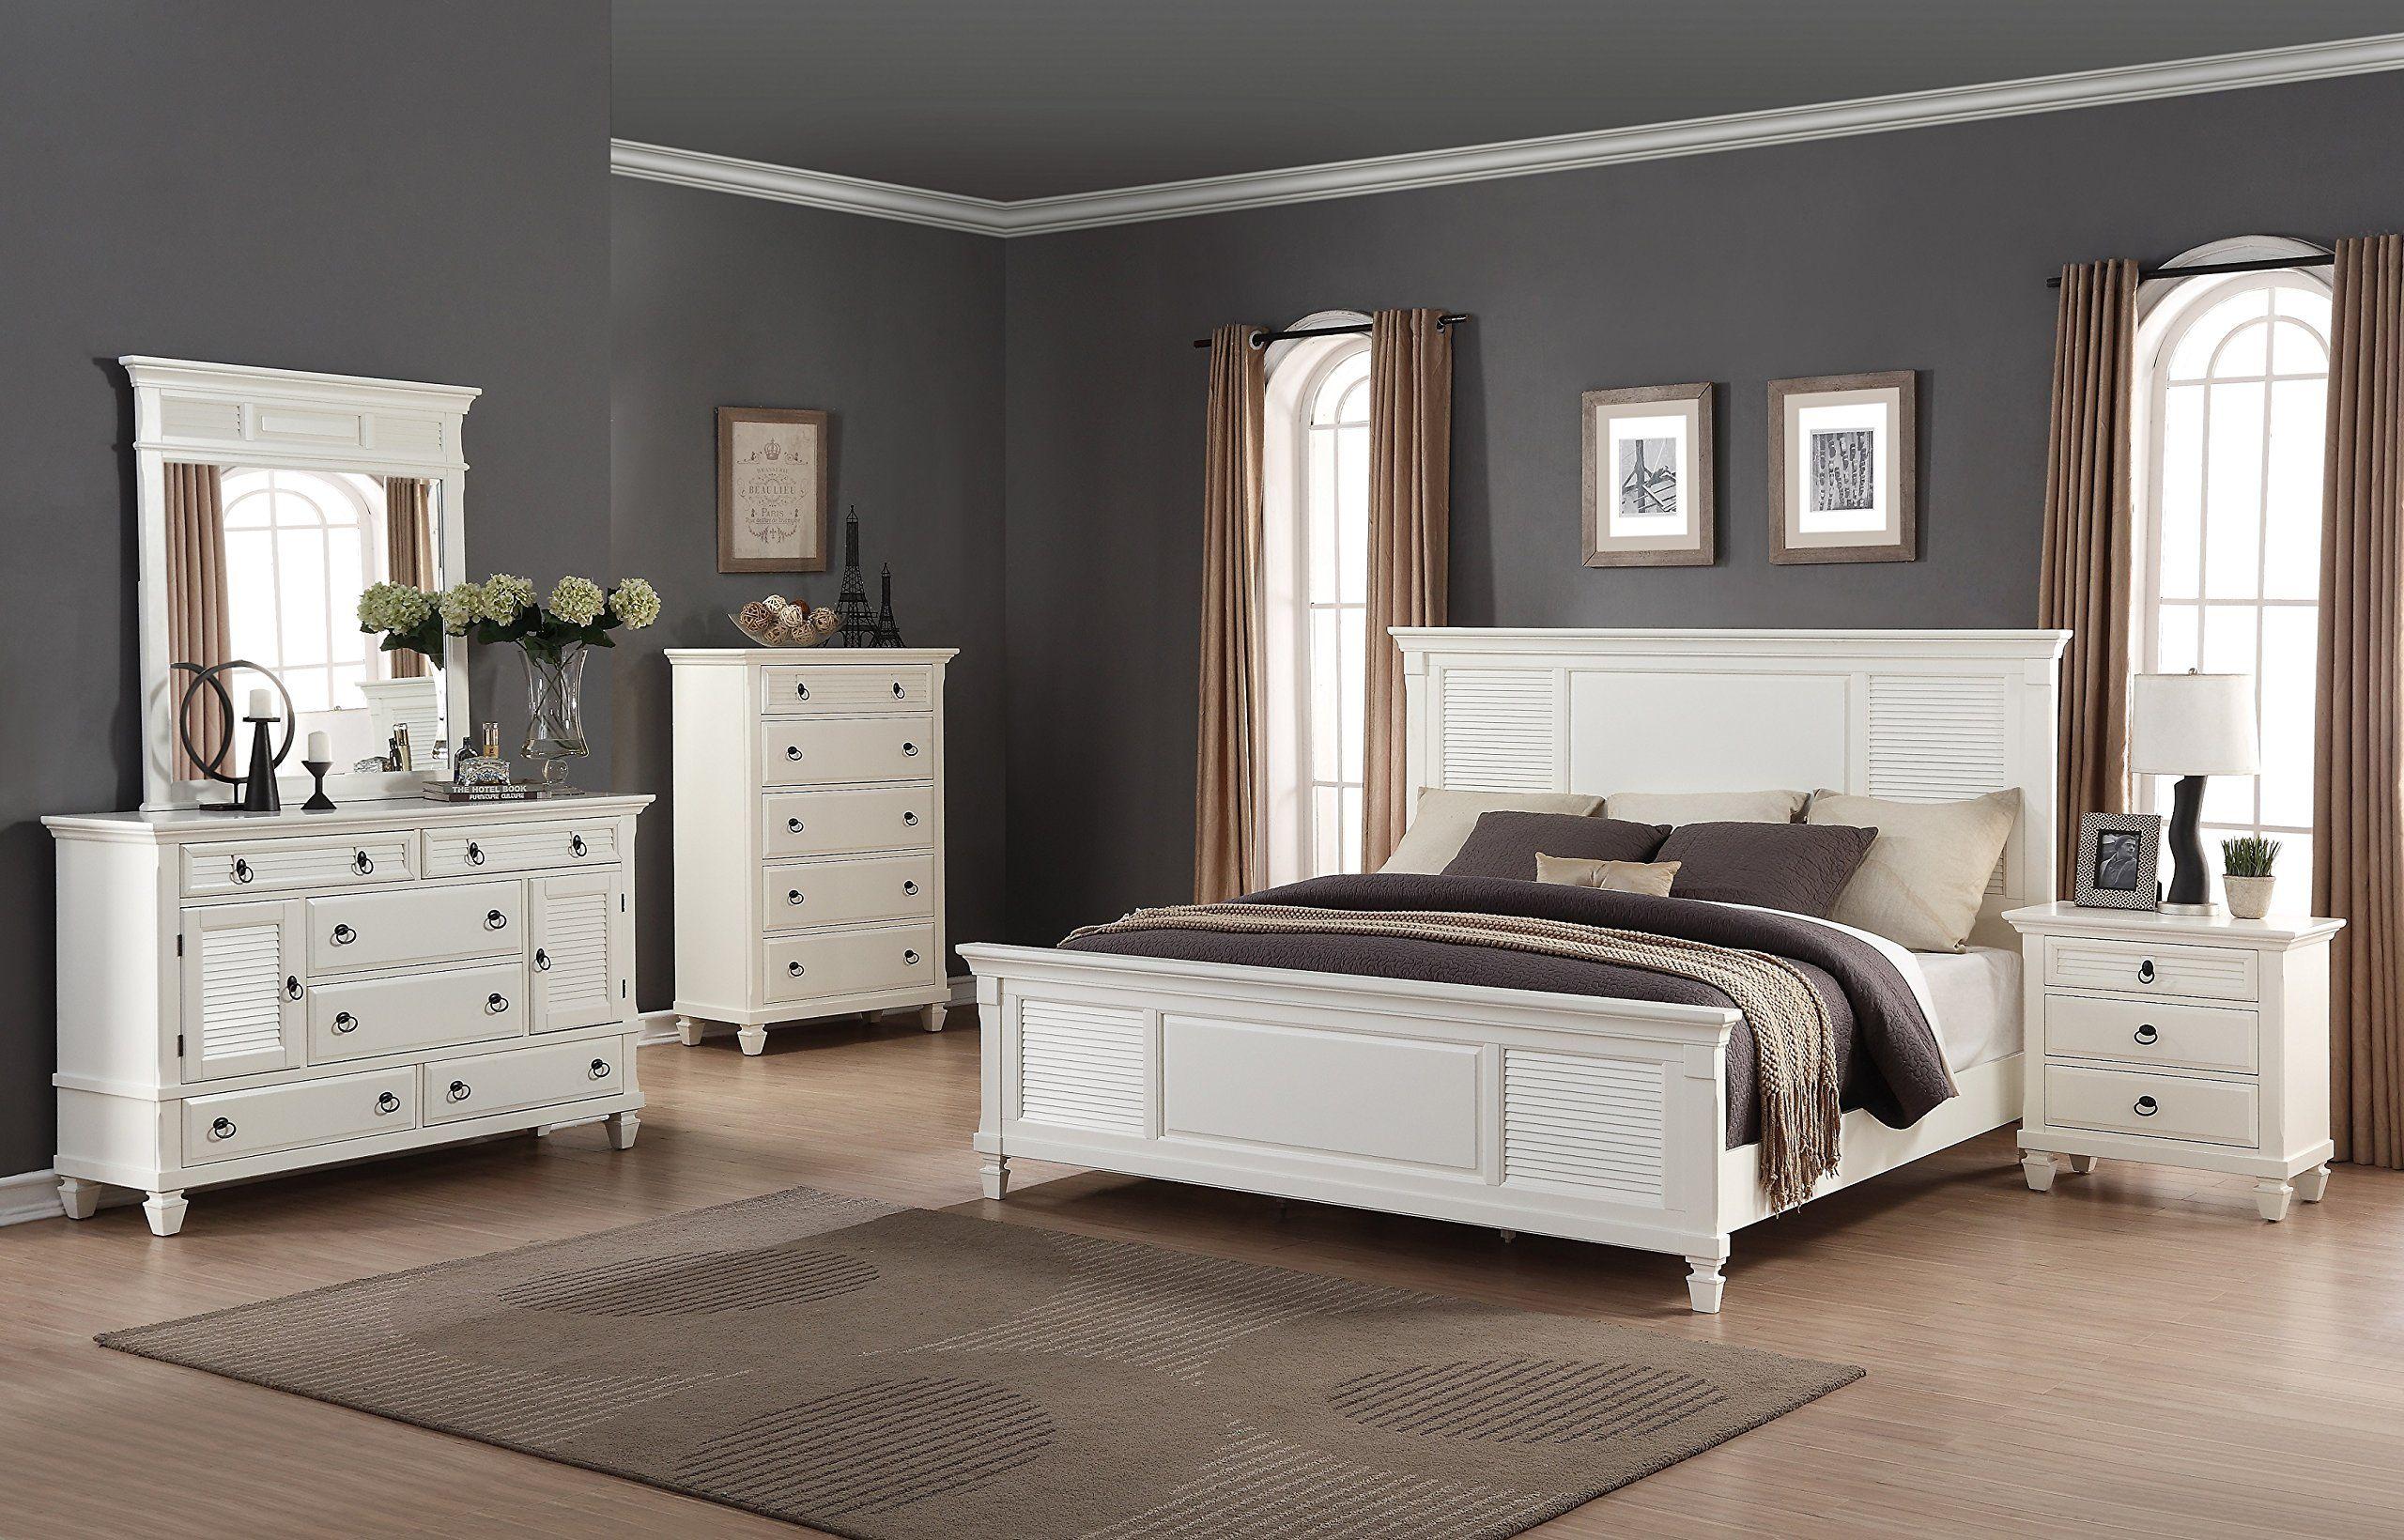 Roundhill furniture regitina bedroom furniture set queen bed